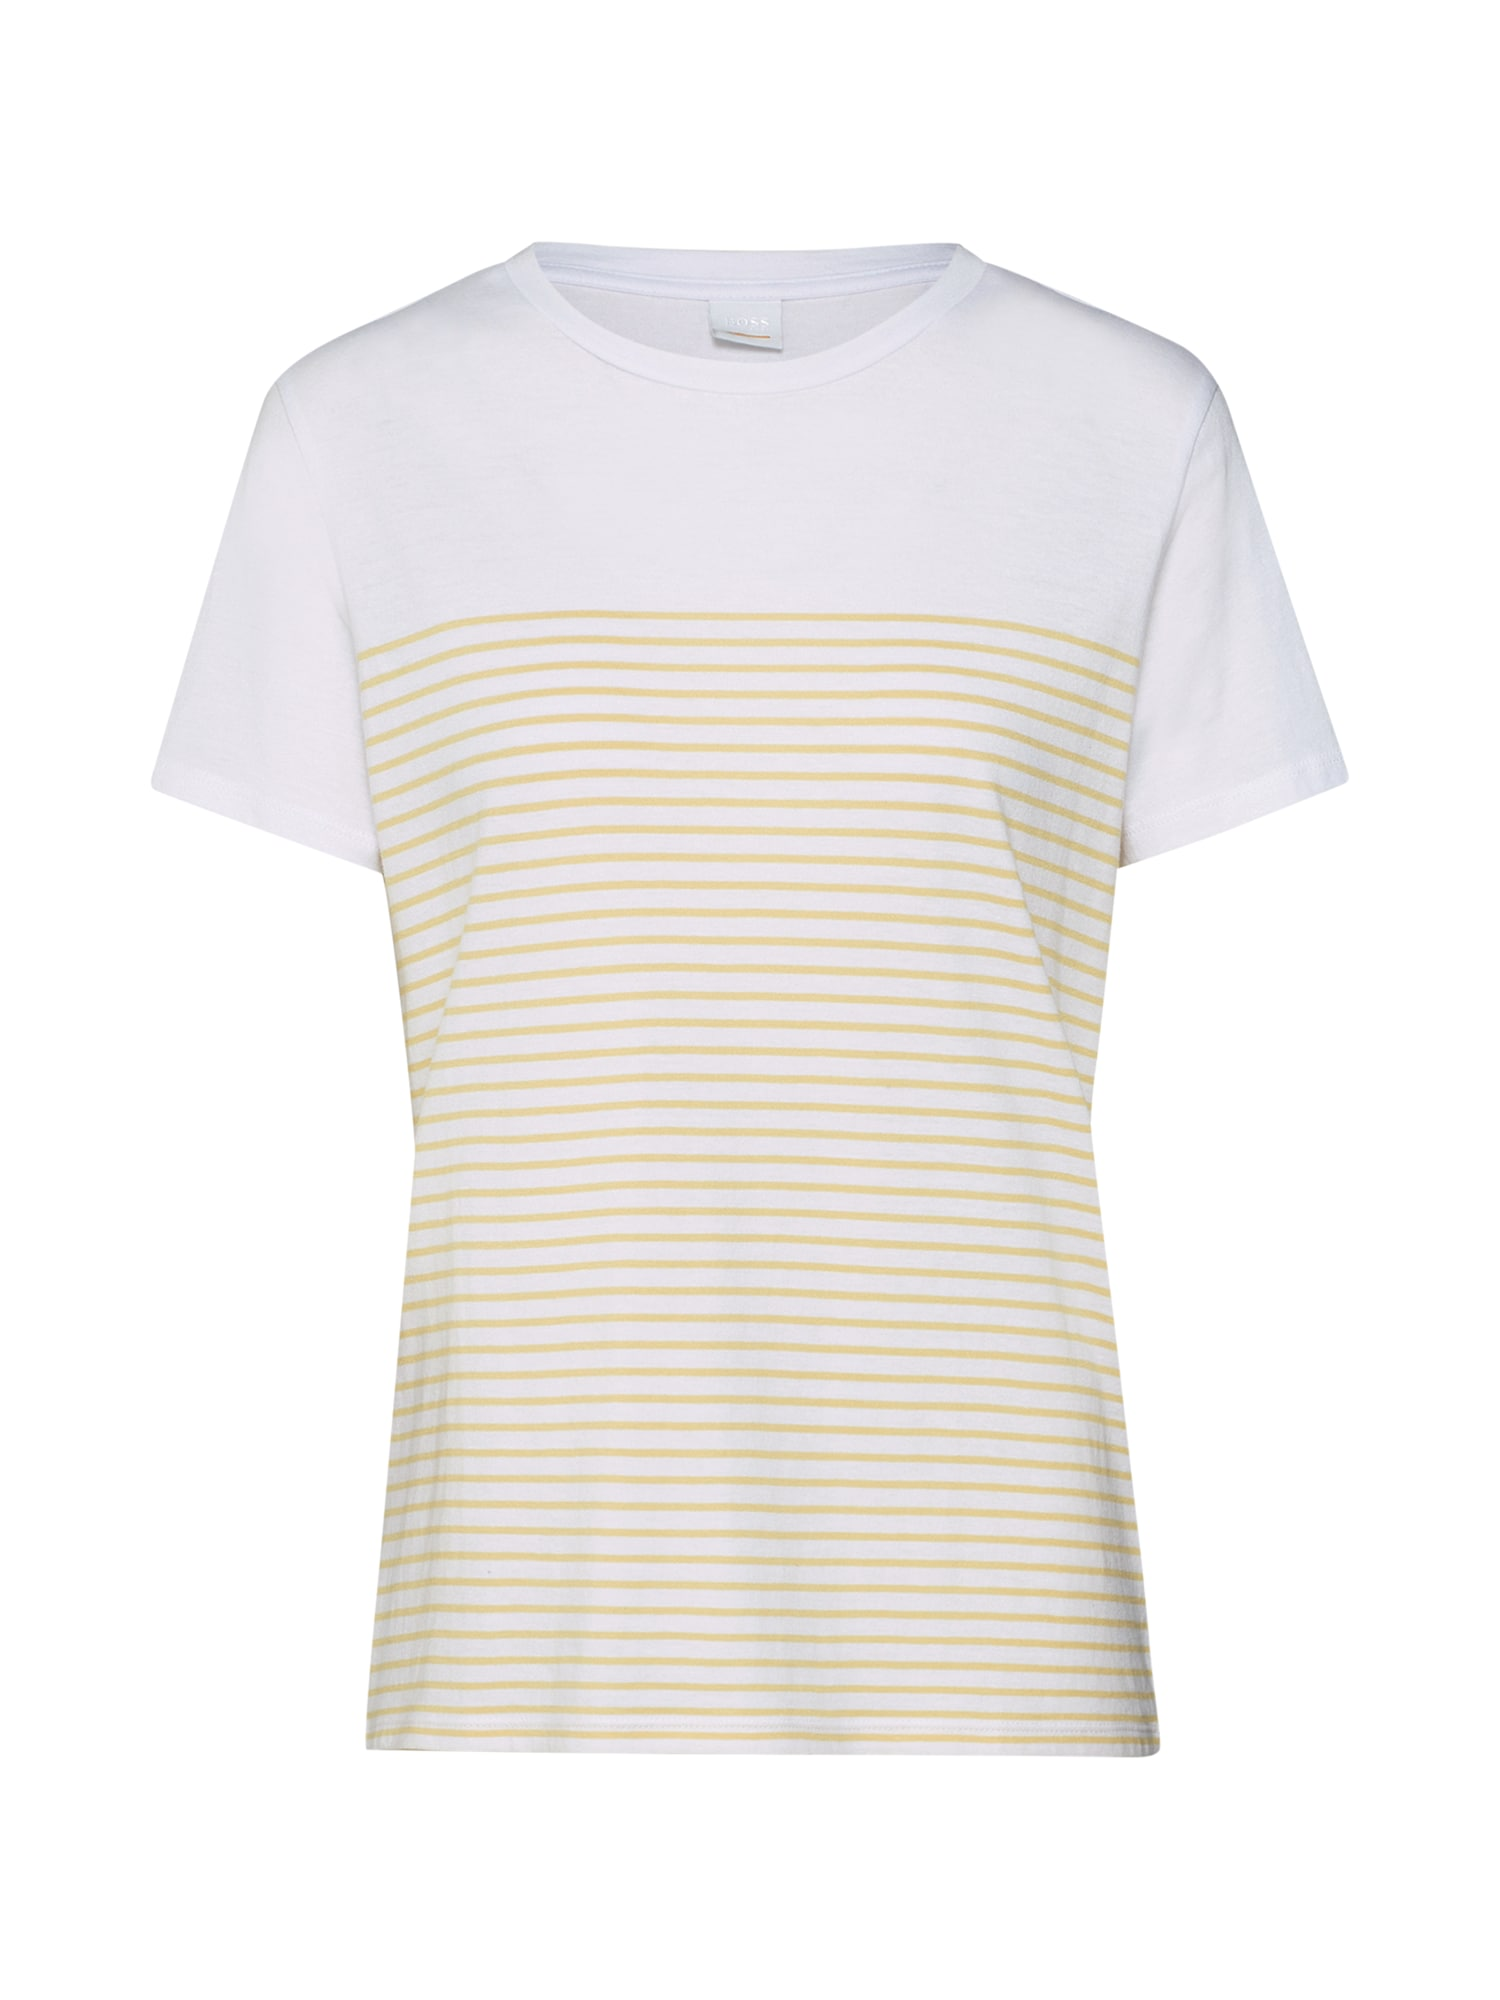 Tričko Tefresh žlutá bílá BOSS